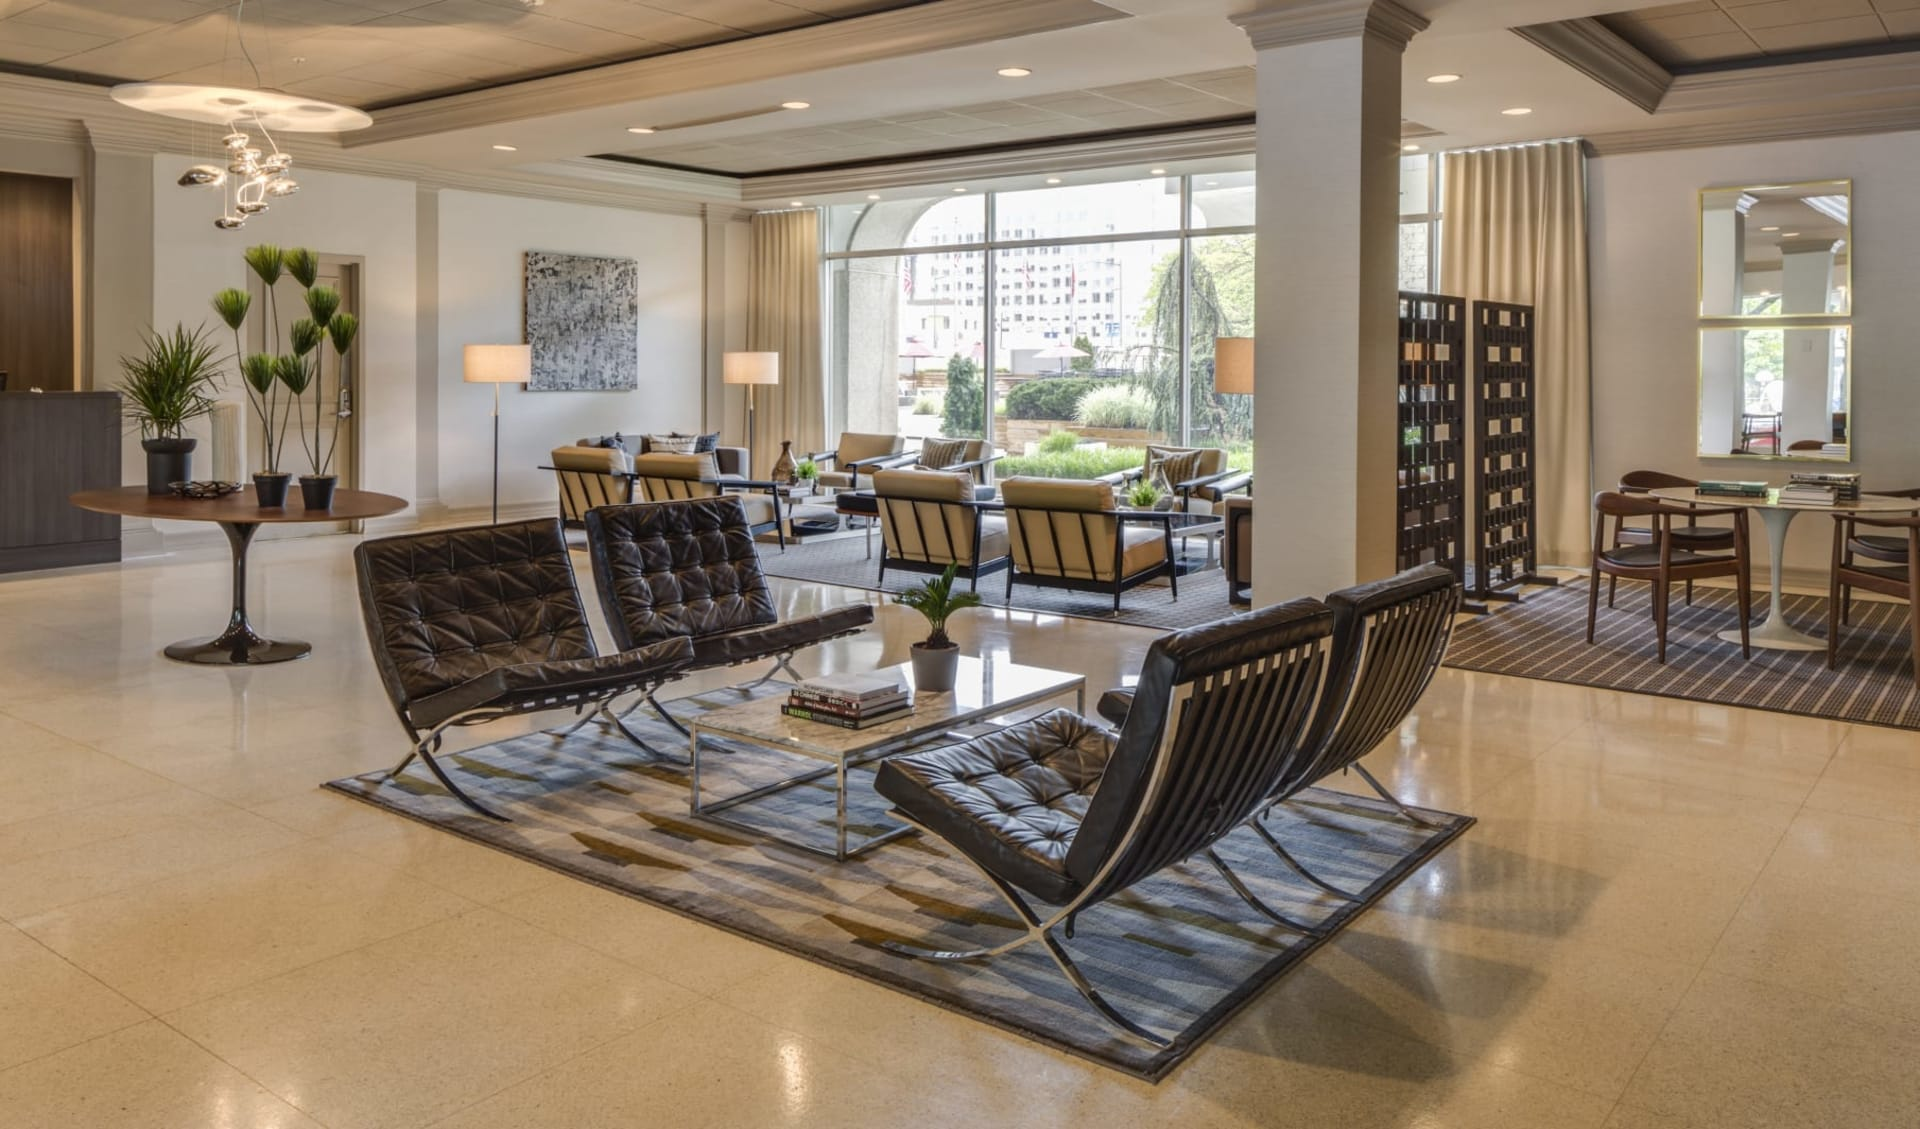 Capitol Skyline Hotel in Washington D.C.: Lobby